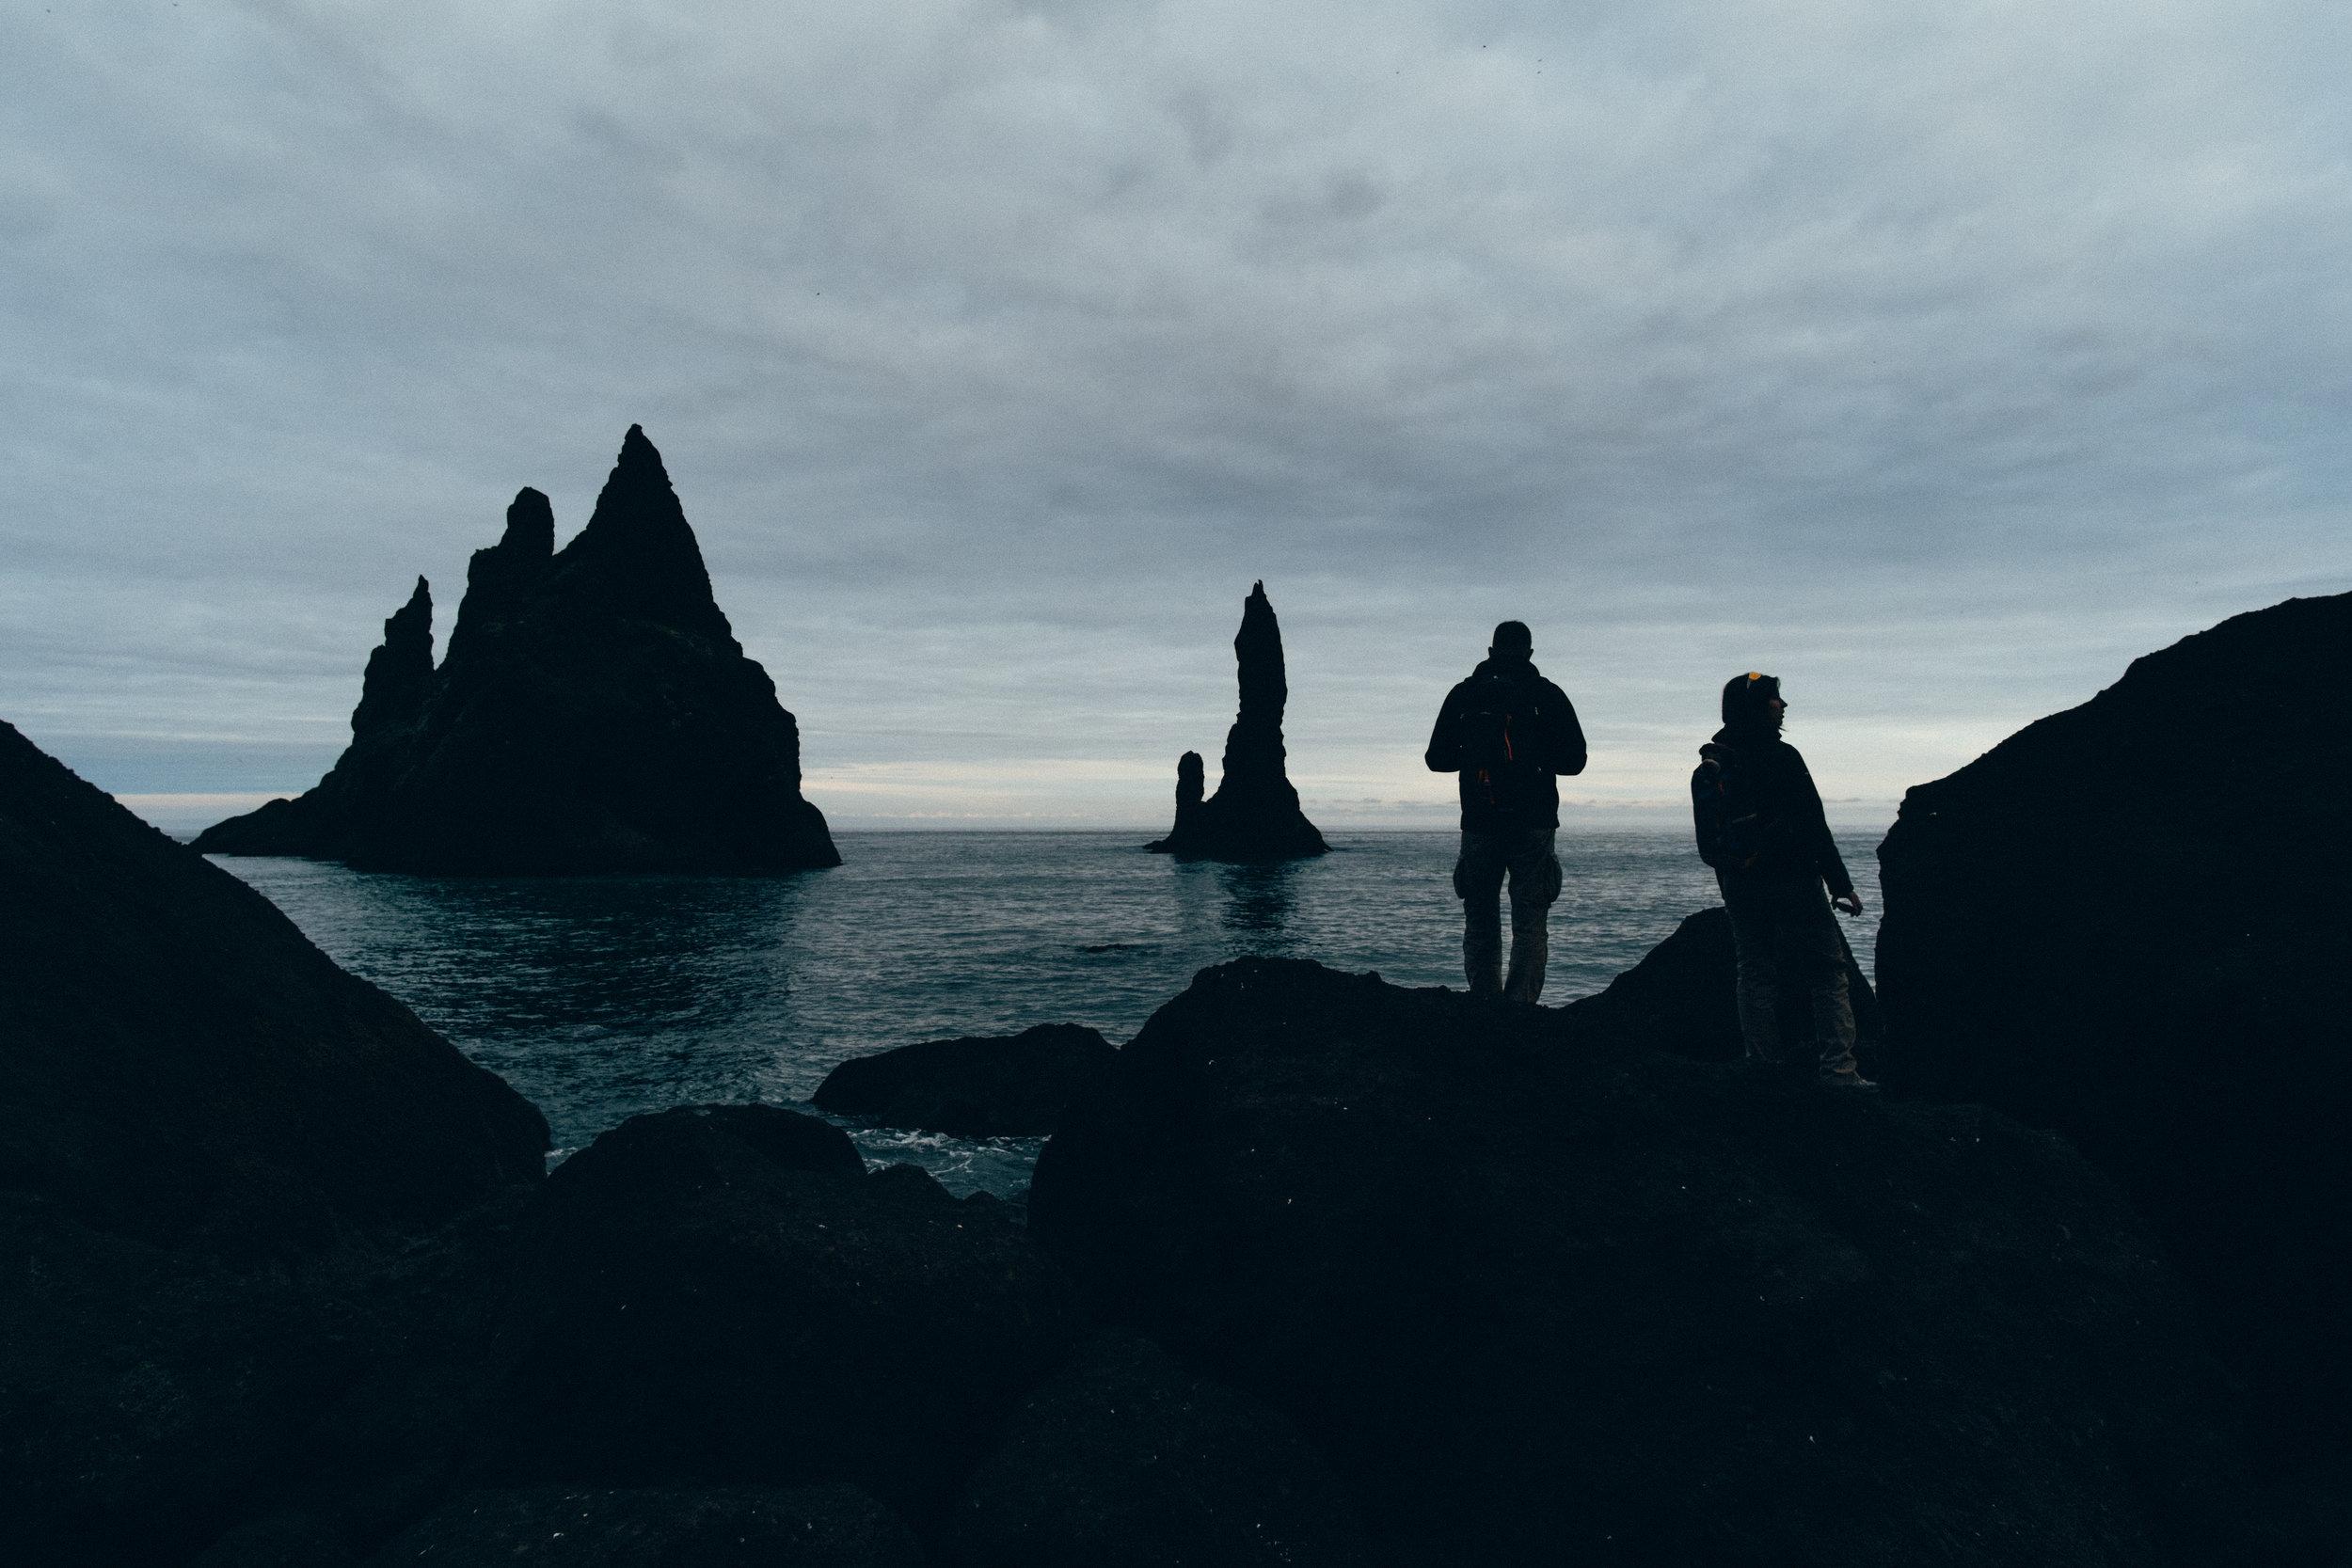 Reynisdrangar Cliffs Silhouette